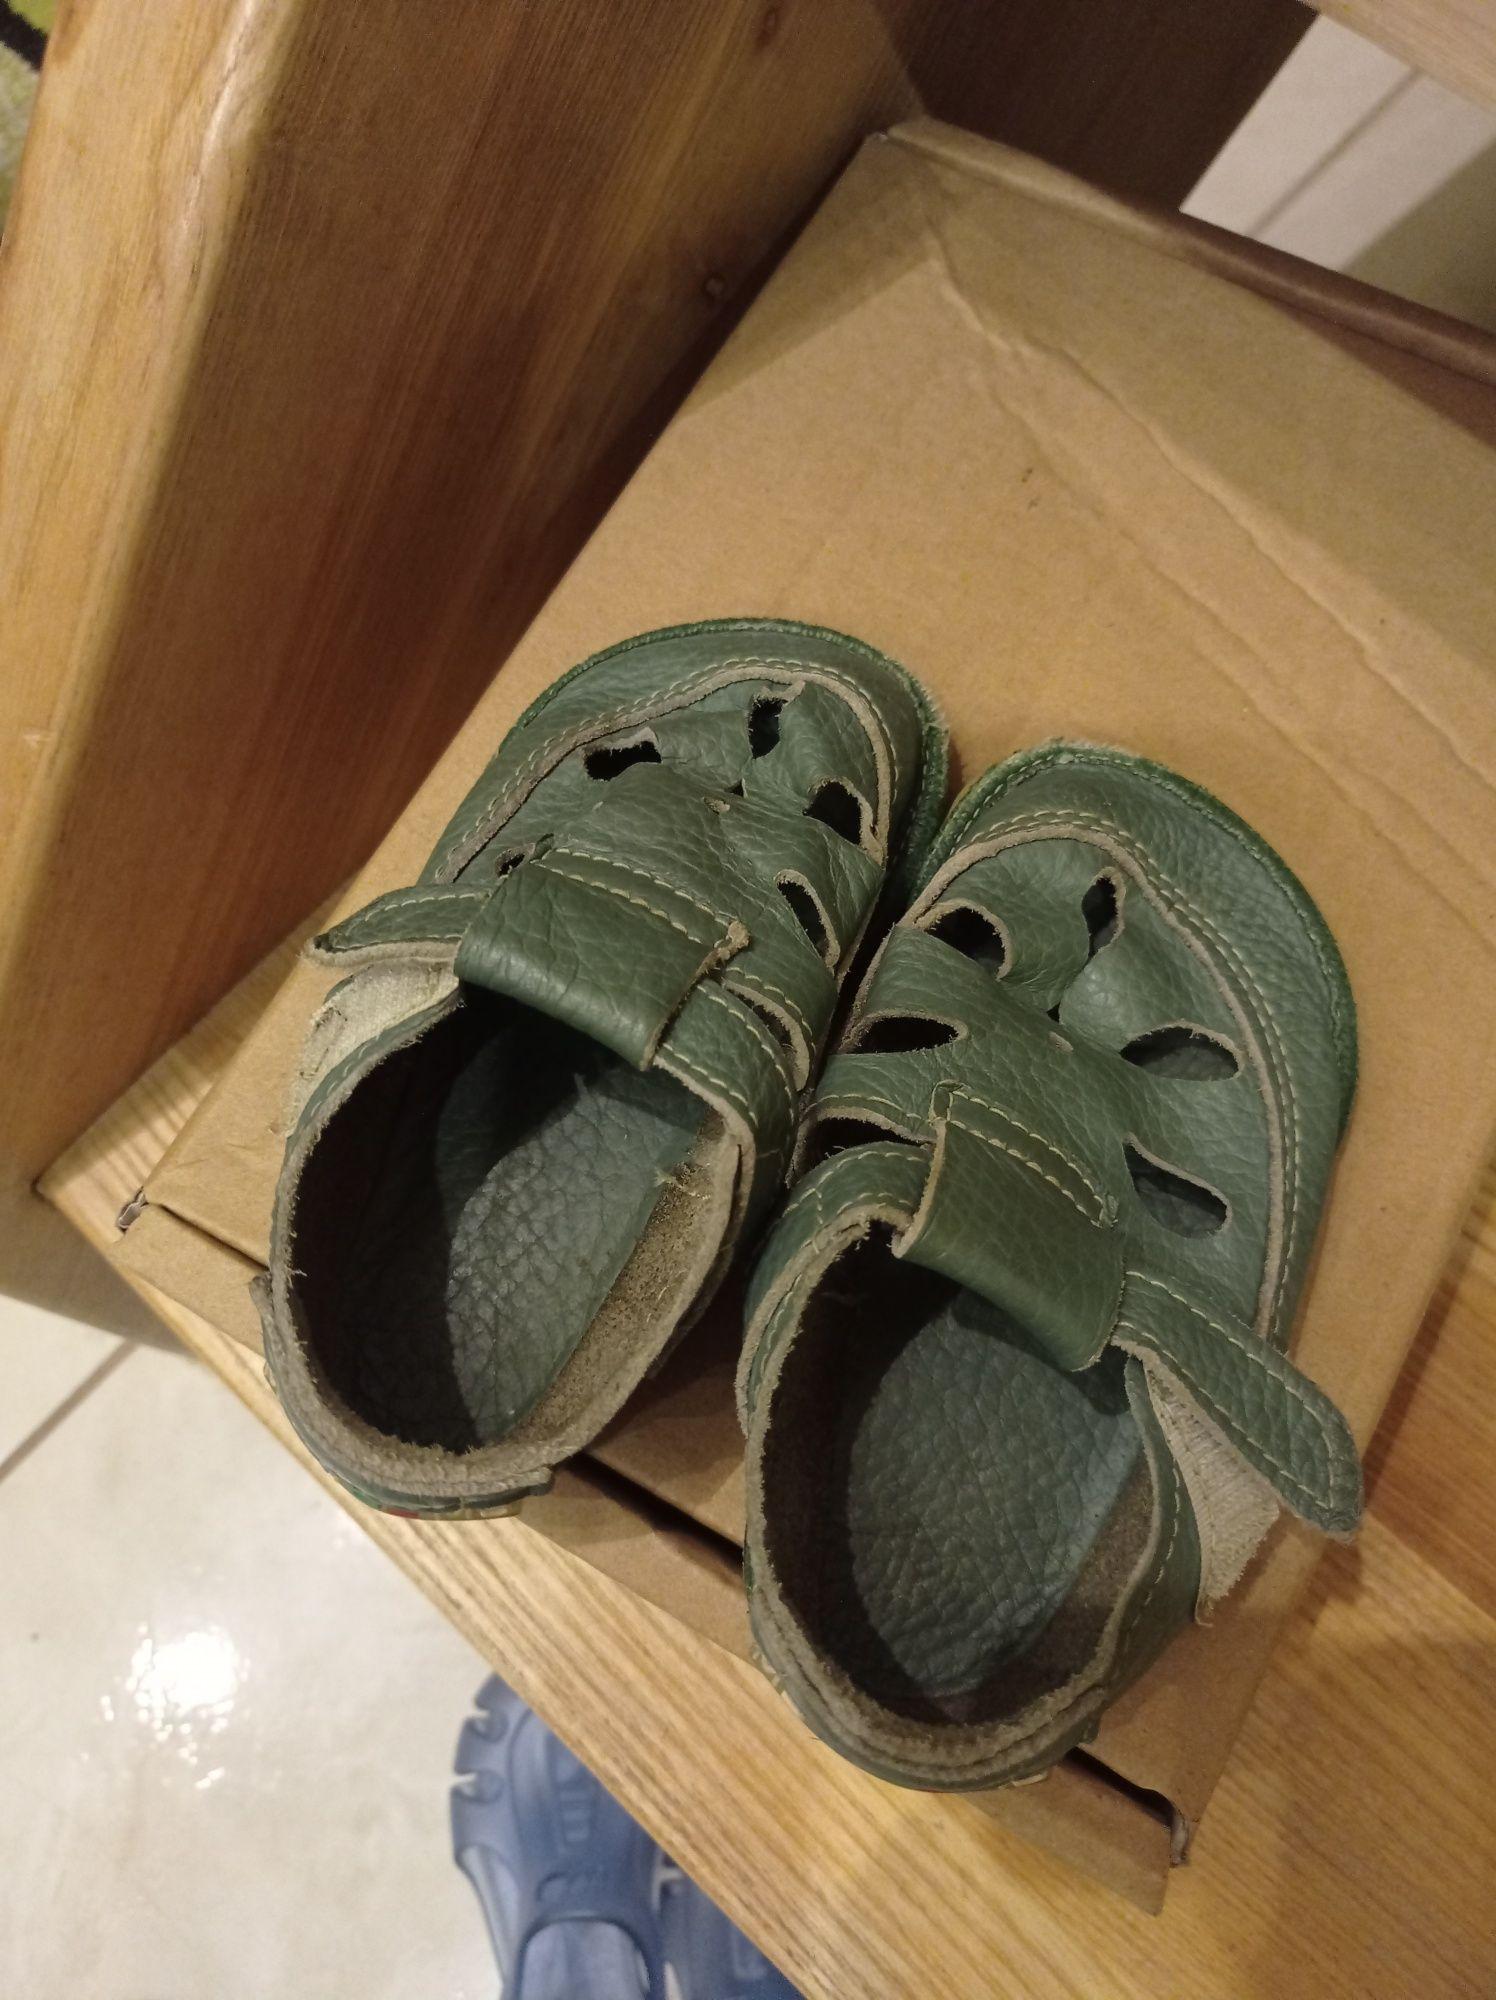 Skórzane sandały Magical shoes jak tikki 21